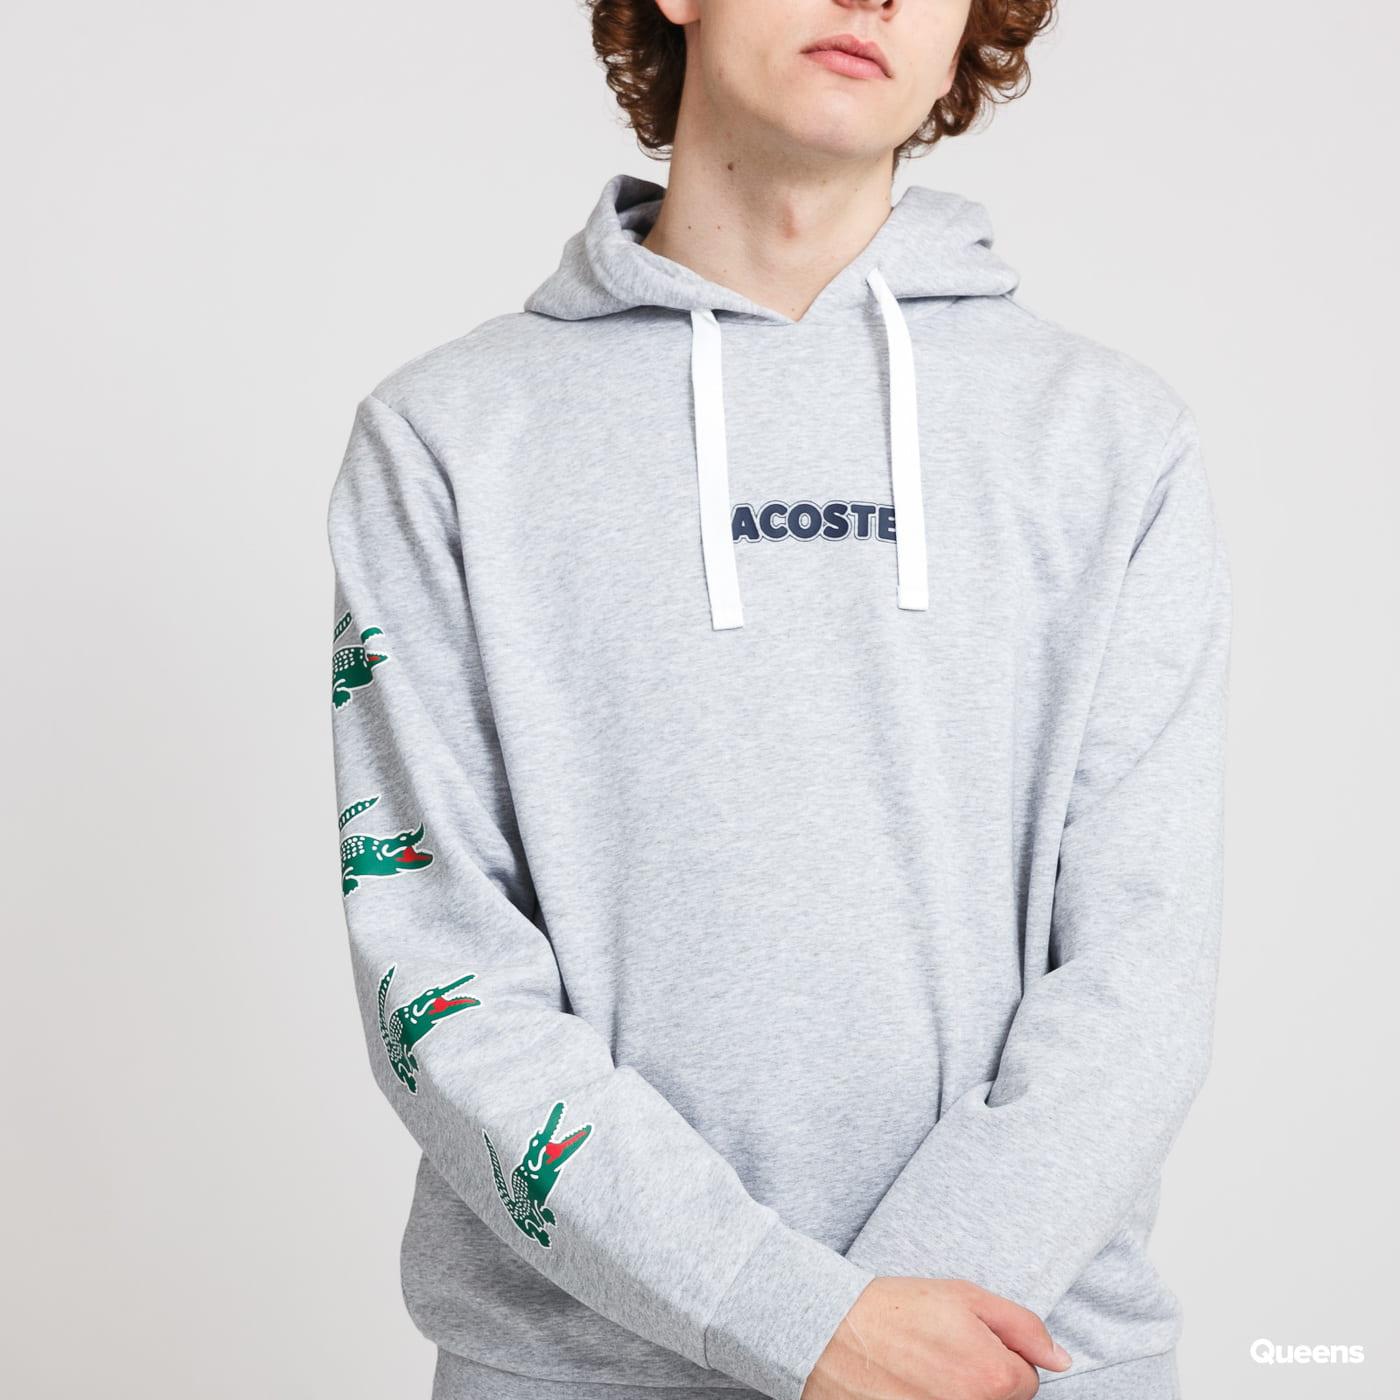 LACOSTE Crocodile Print Hooded Cotton Sweatshirt melange gray